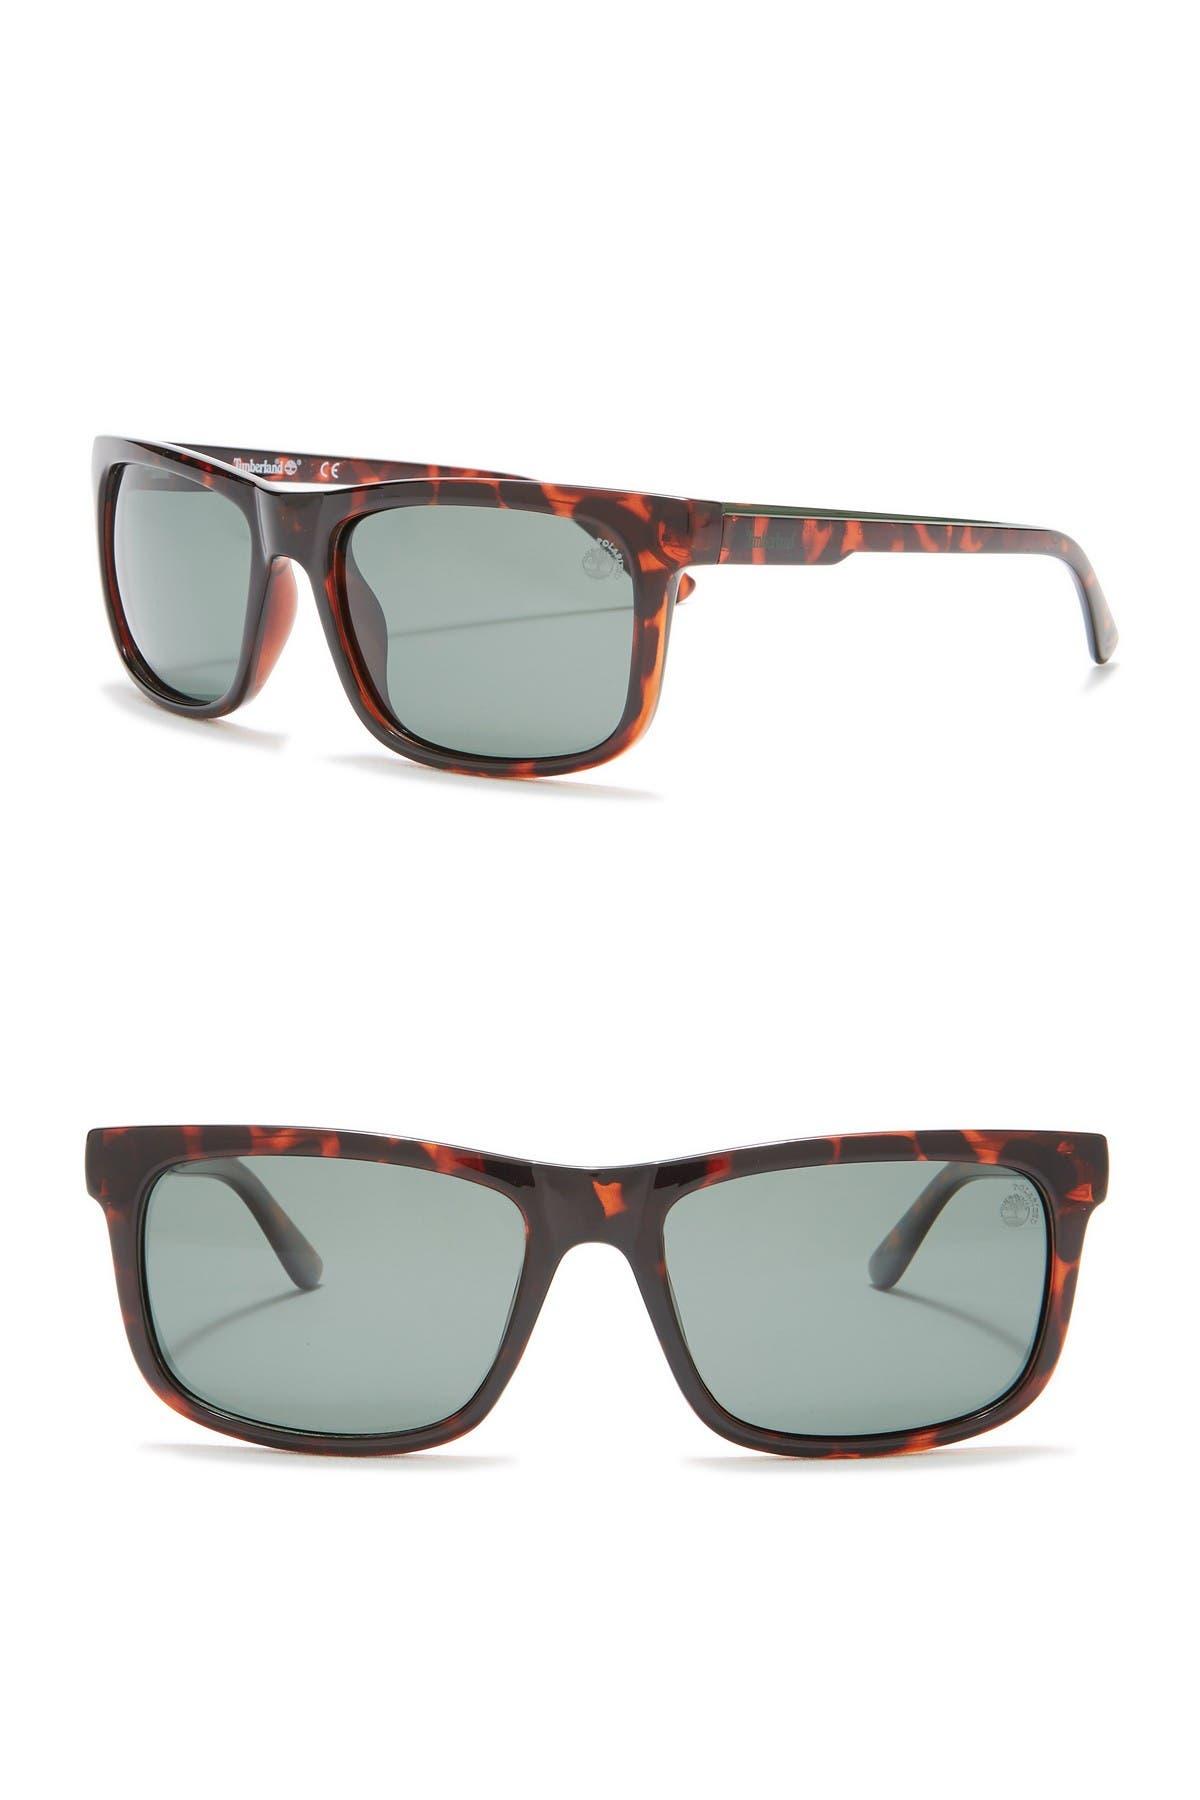 Image of Timberland Polarized 56mm Retro Sunglasses